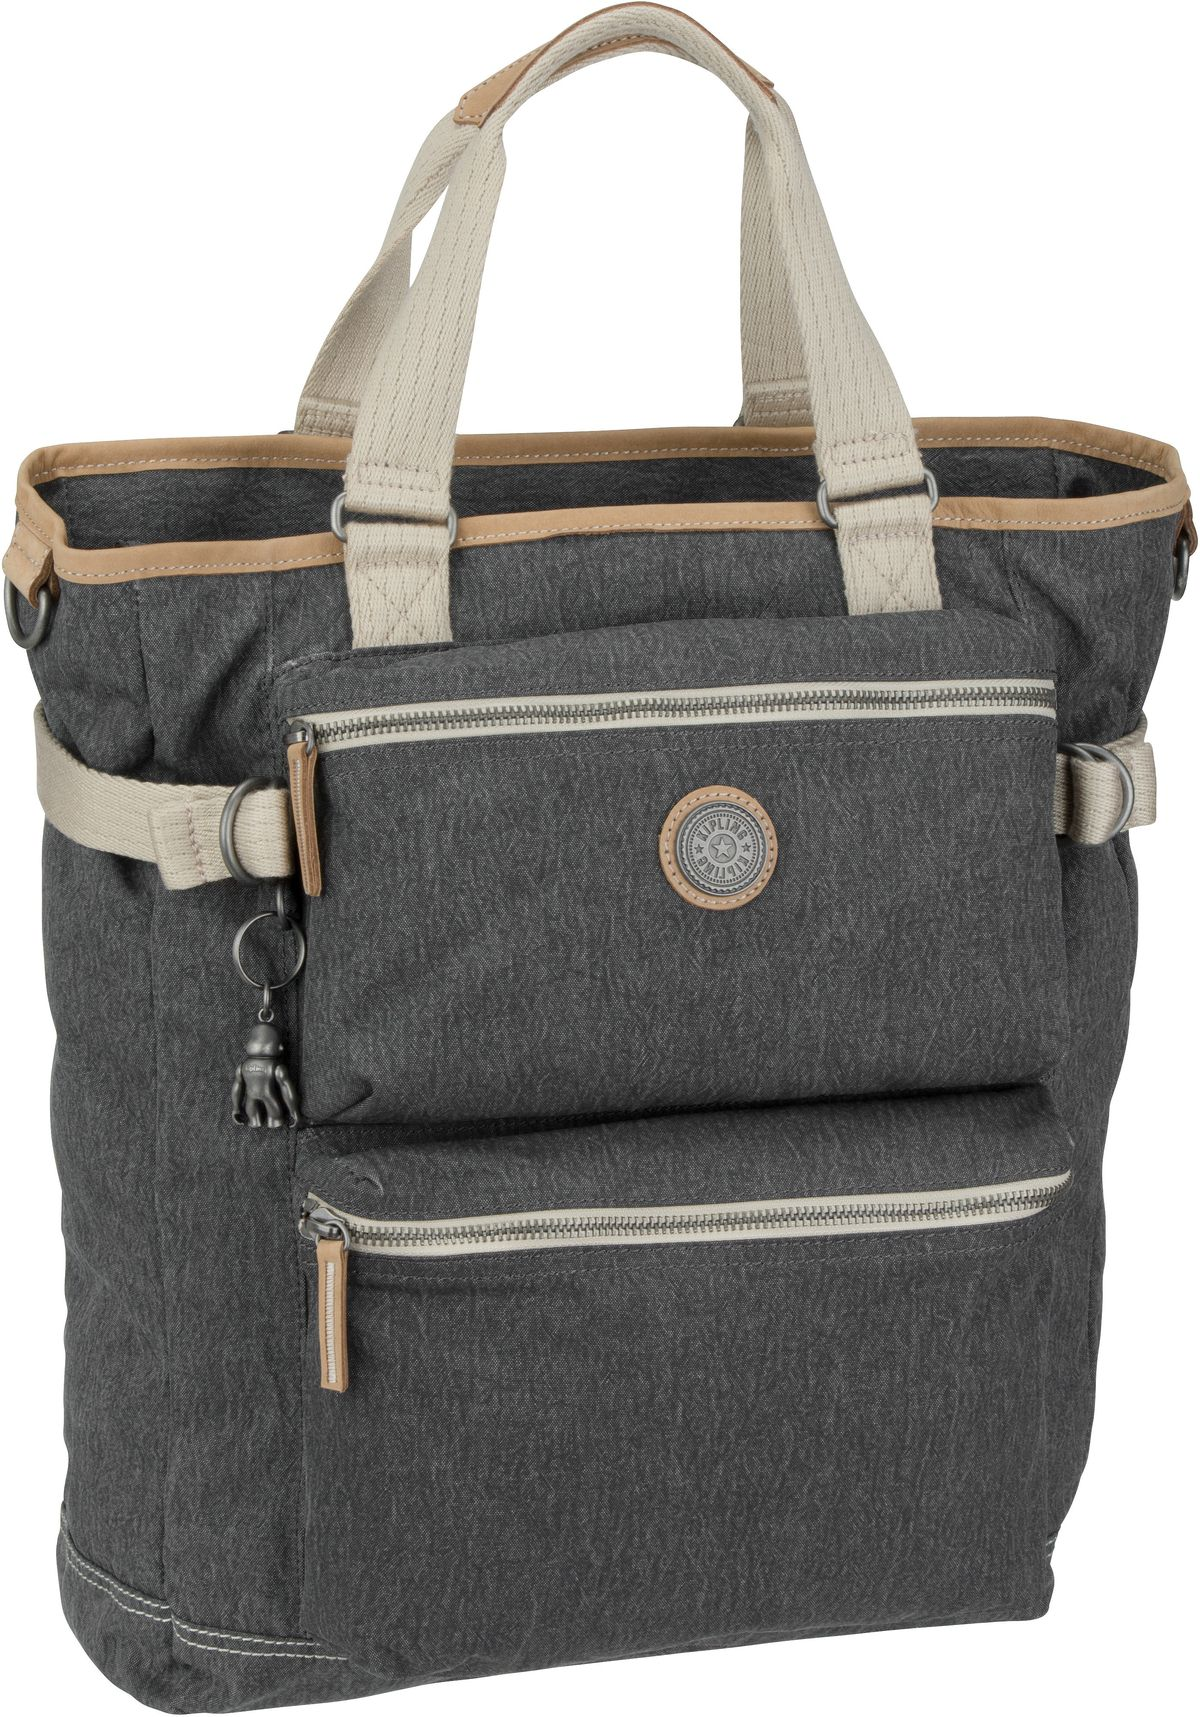 Handtasche Laslo Edgeland Casual Grey (28 Liter)